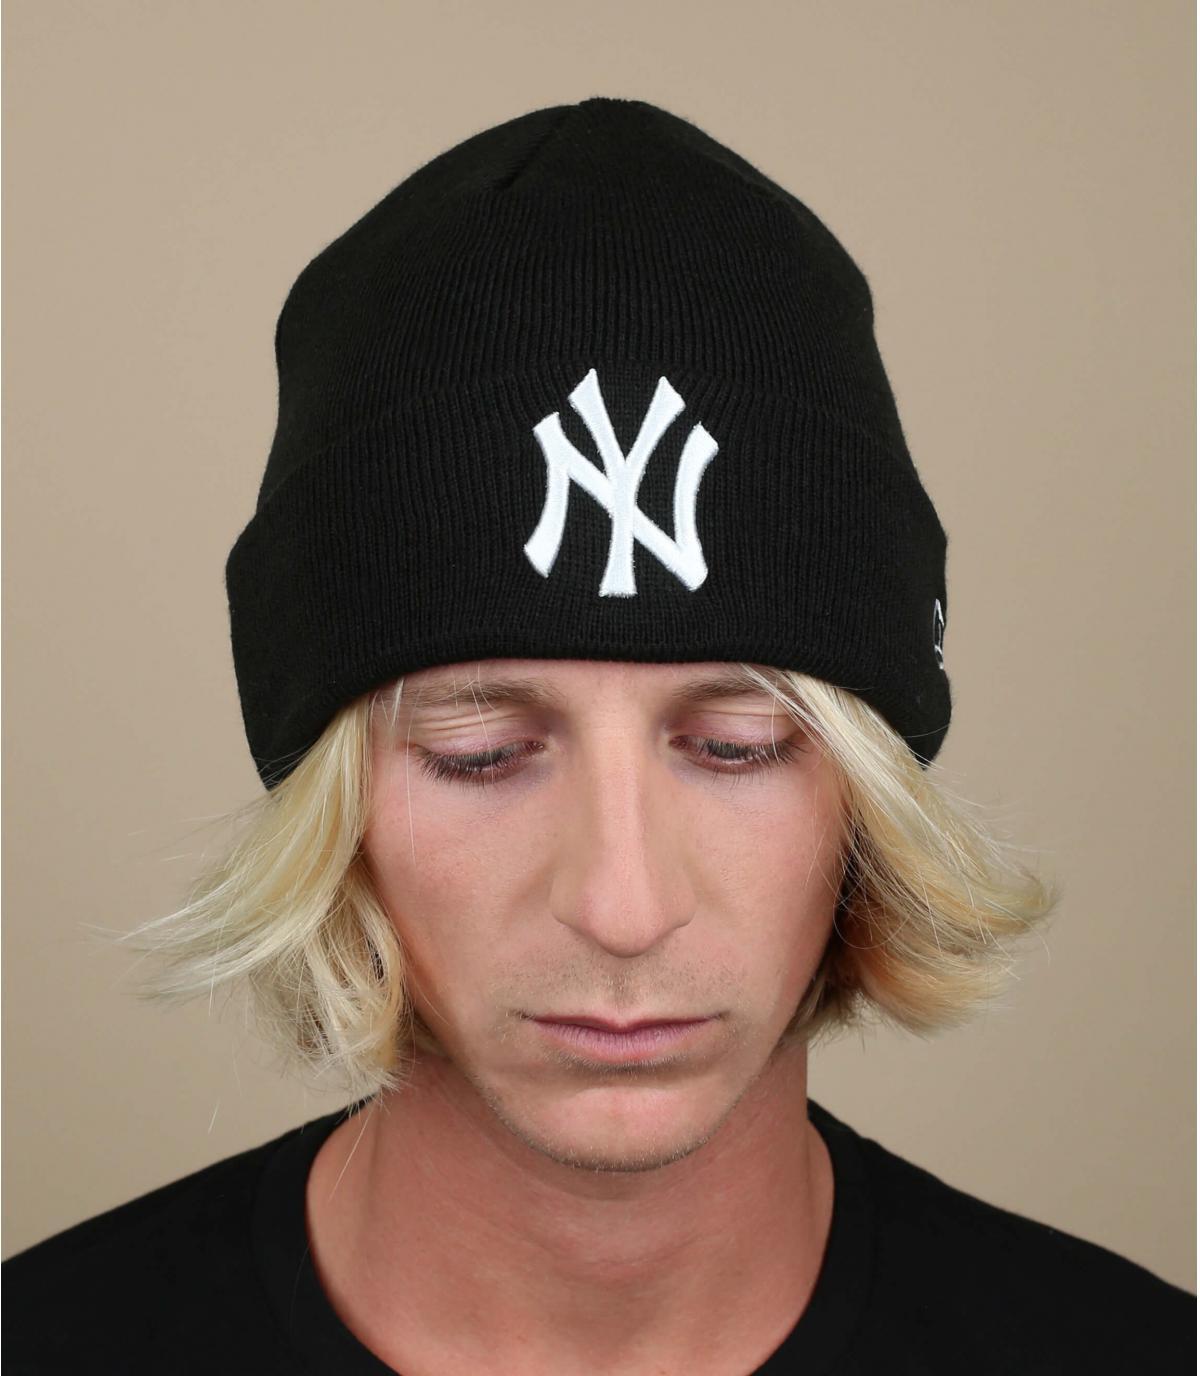 Cappellino NY bavero nero bianco